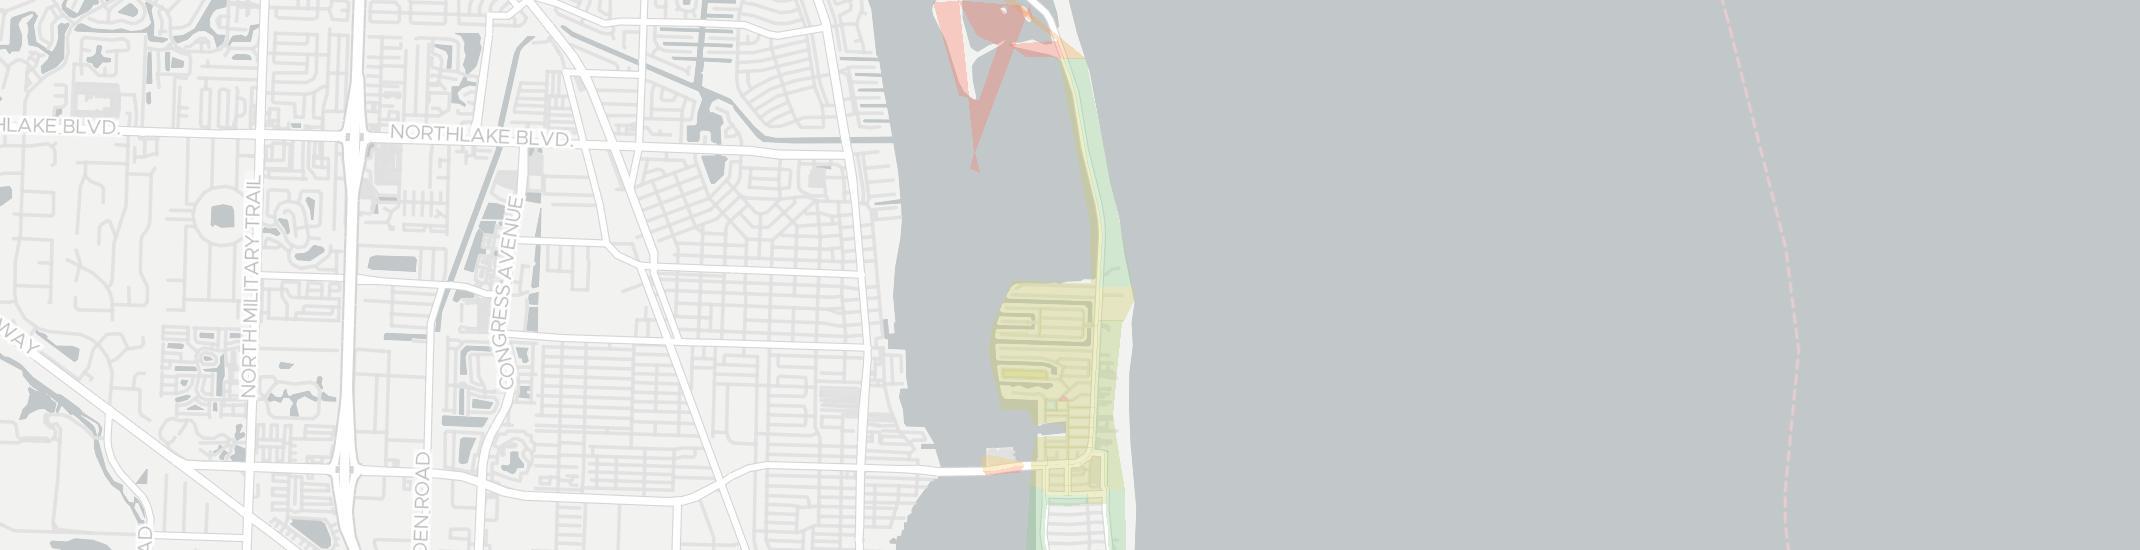 Singer Island Florida Map.Internet Providers In Singer Island Fl Compare 11 Providers